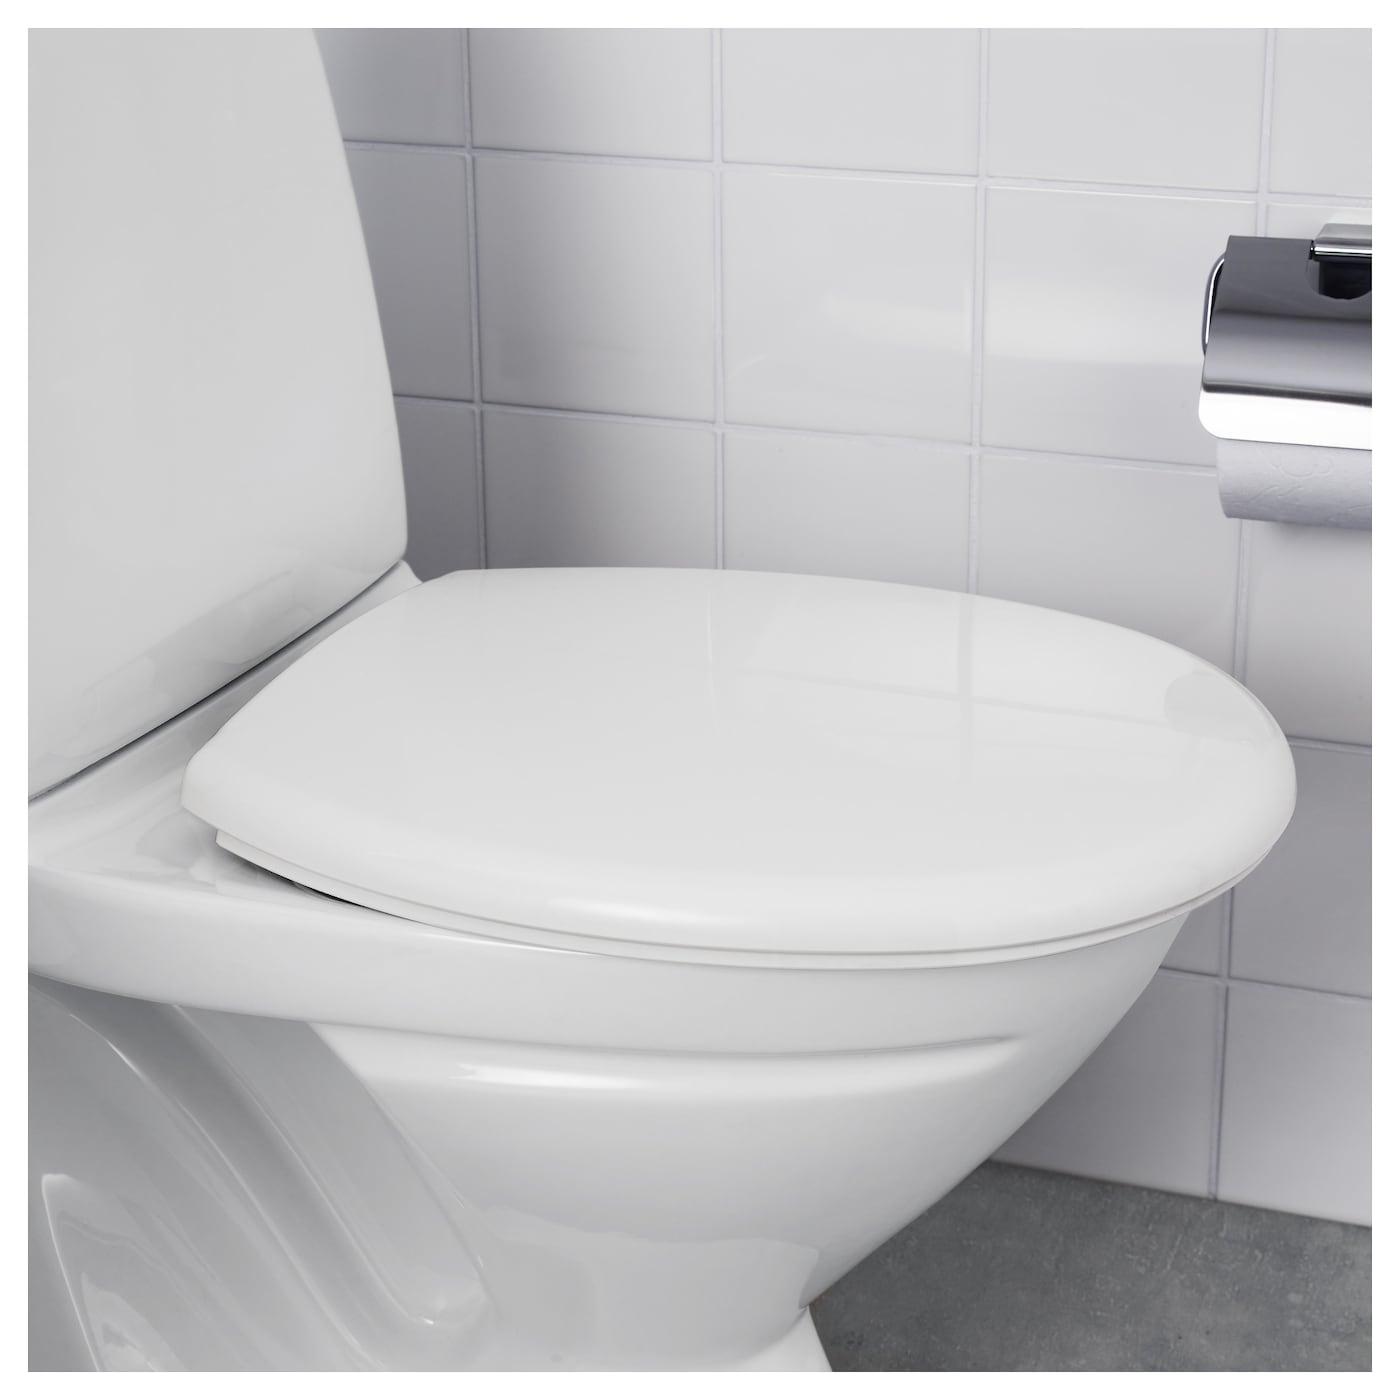 IKEA VALLOXEN toilet seat VALLOXEN Toilet seat